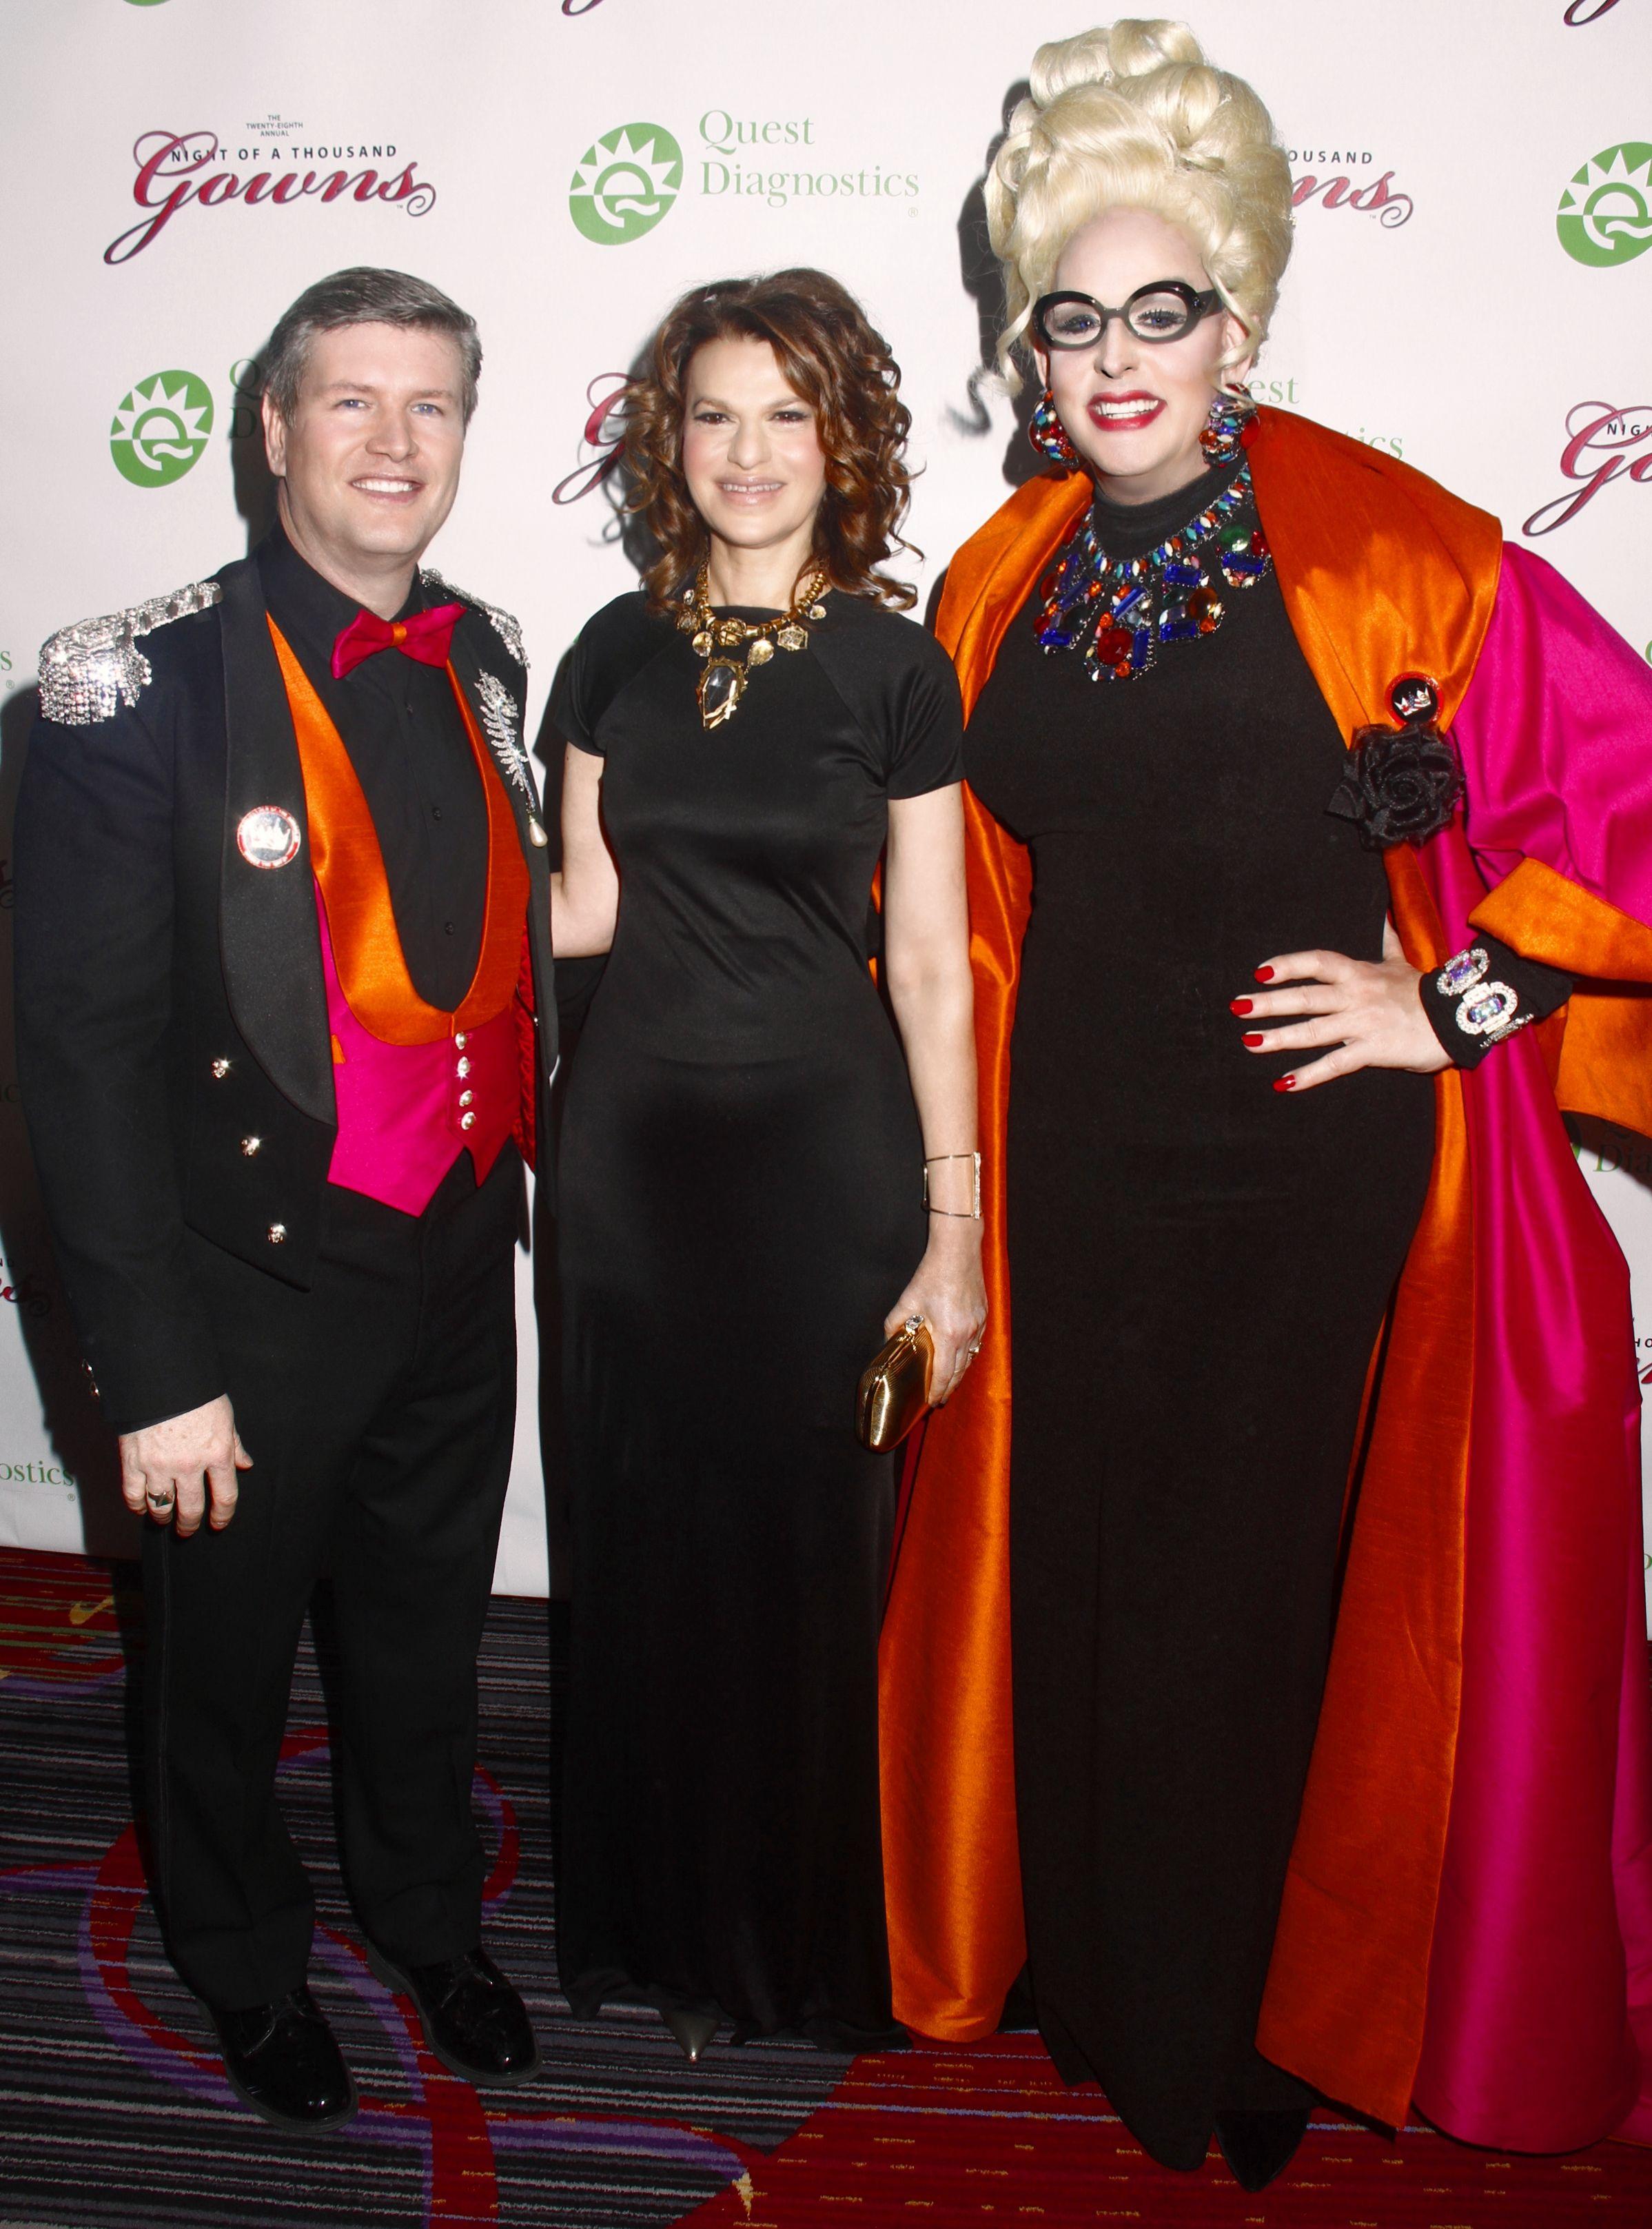 DorisDearNY and Jim with @Sandra Bernhard at Night of a Thousand ...